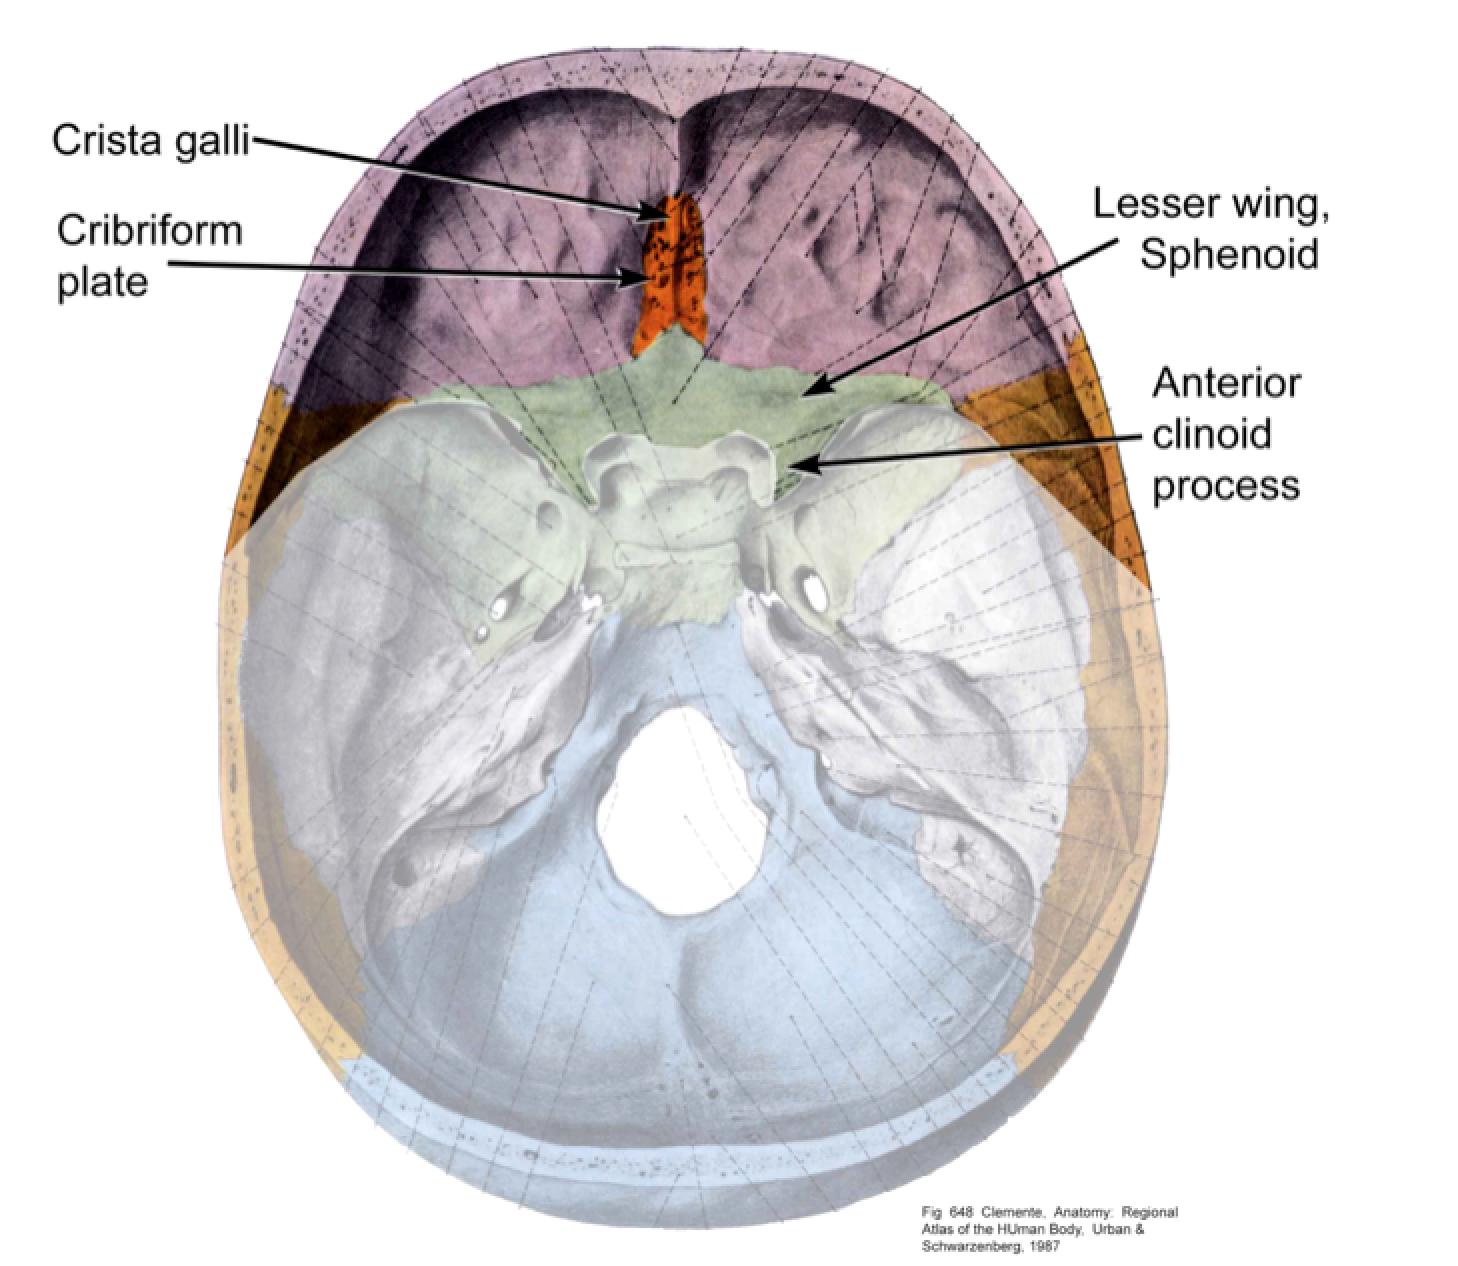 ImageQuiz: Anterior cranial fossa